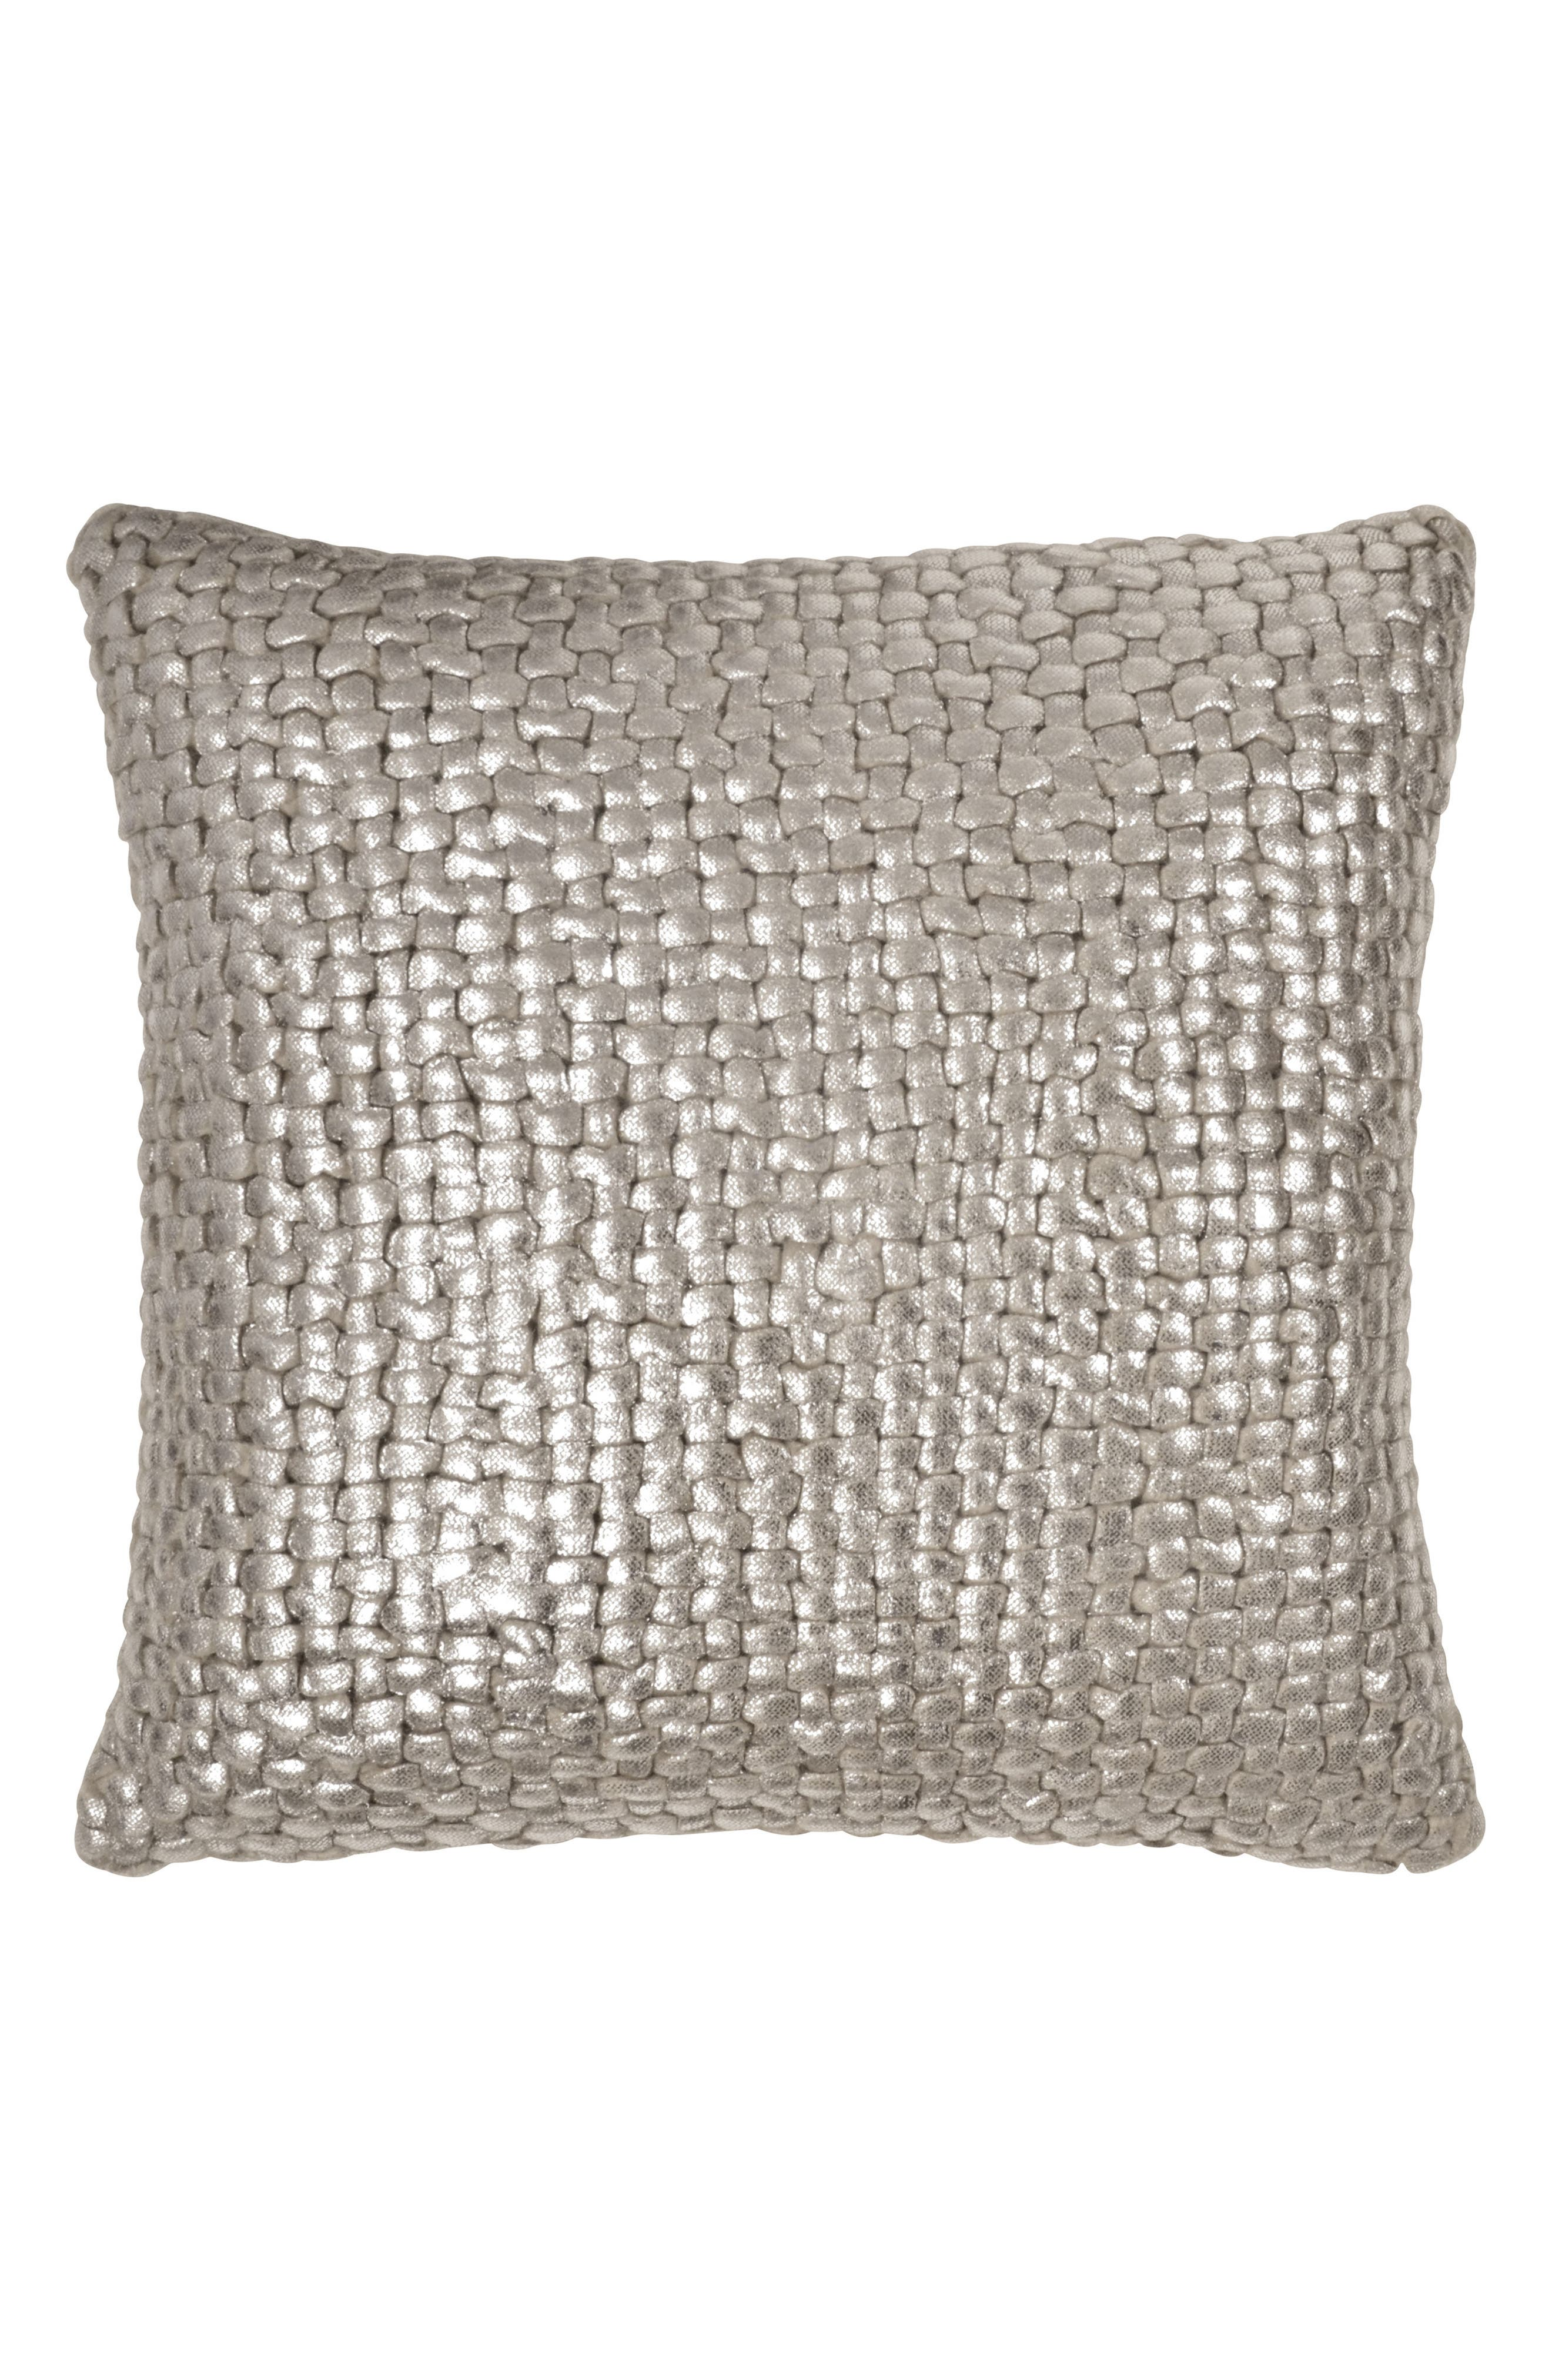 Main Image - Michael Aram Metallic Basket Weave Accent Pillow